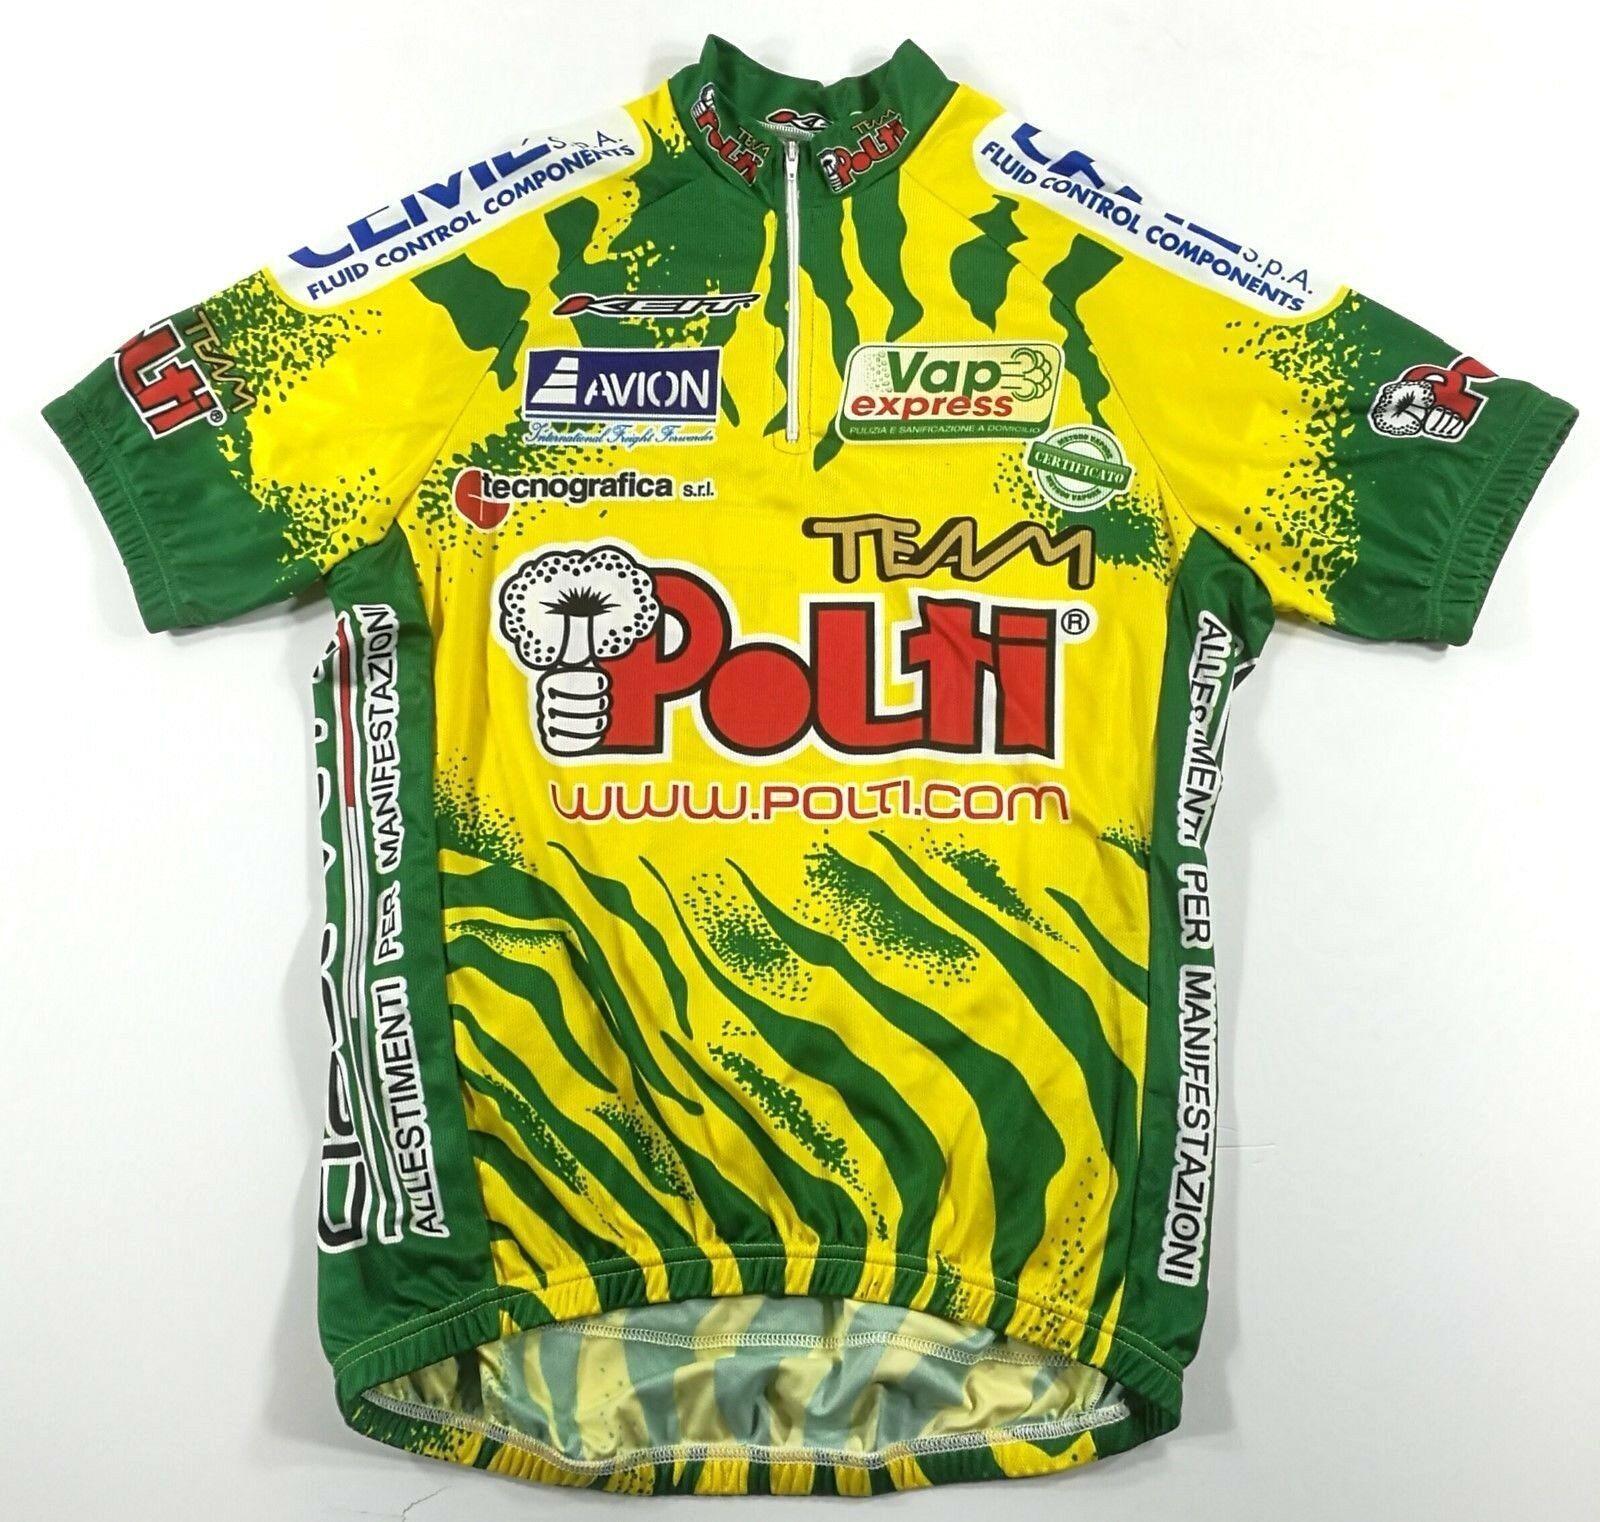 Vintage ciclismo Cycling maglia jersey maillot Polti KEIT taglia tg size xl